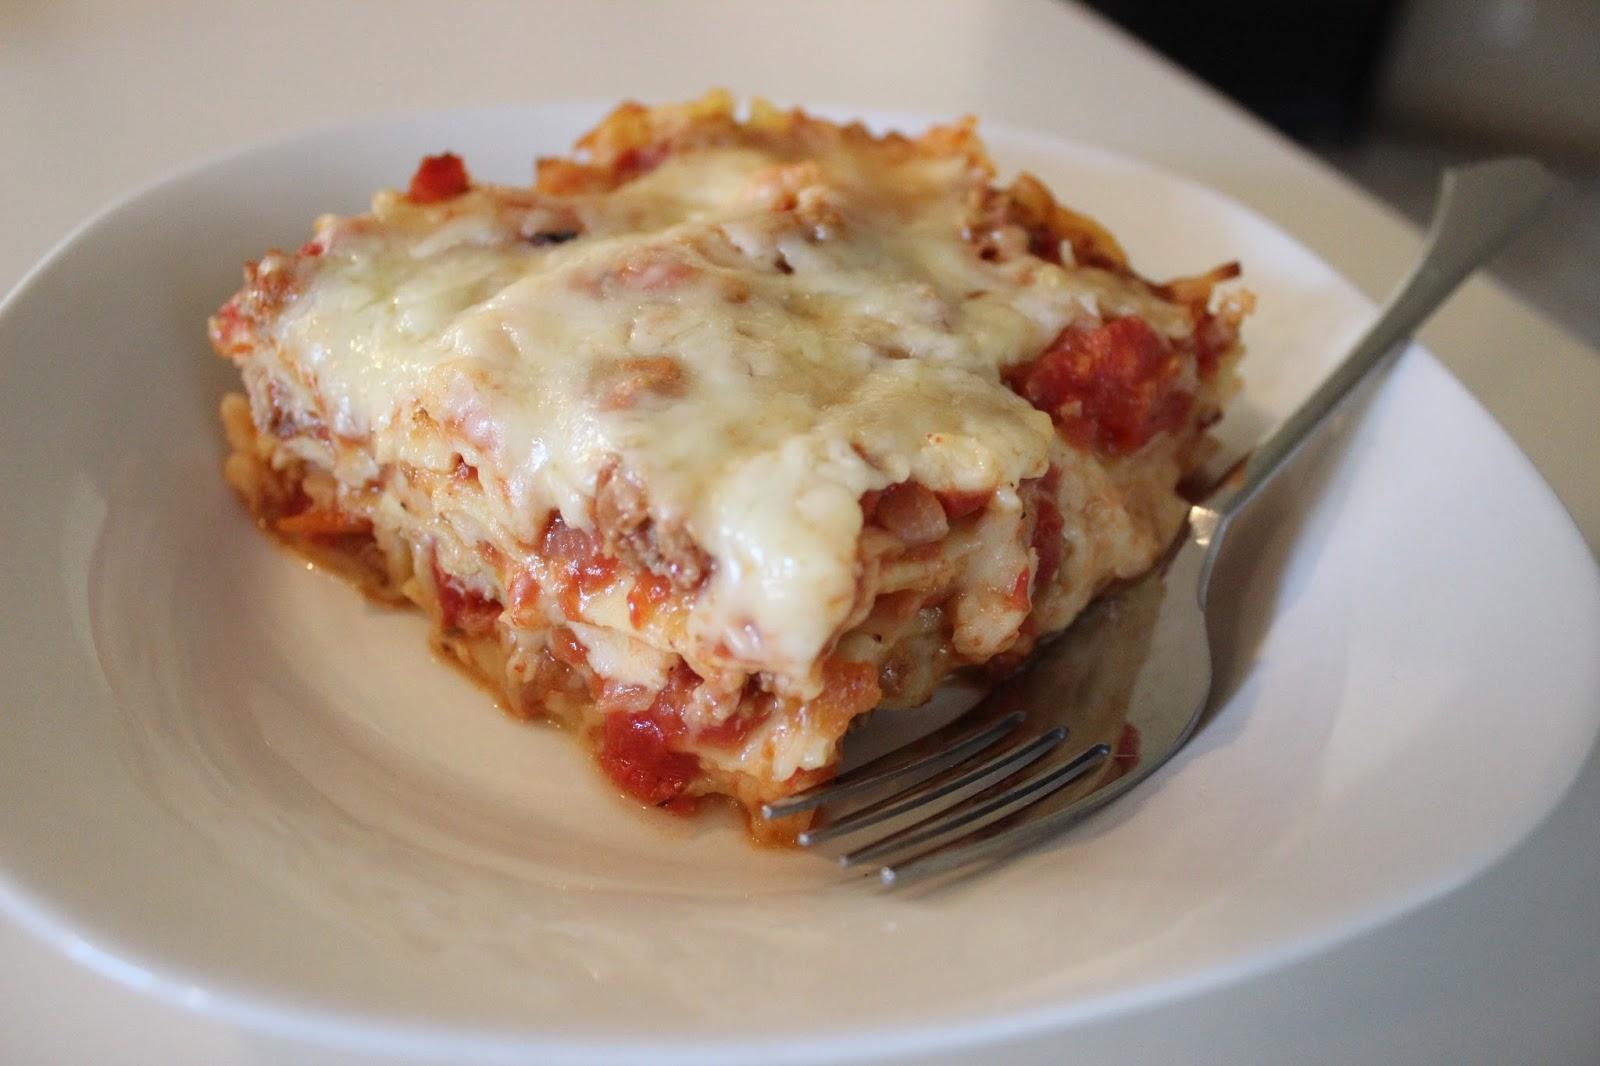 Tomato-Sausage Lasagna